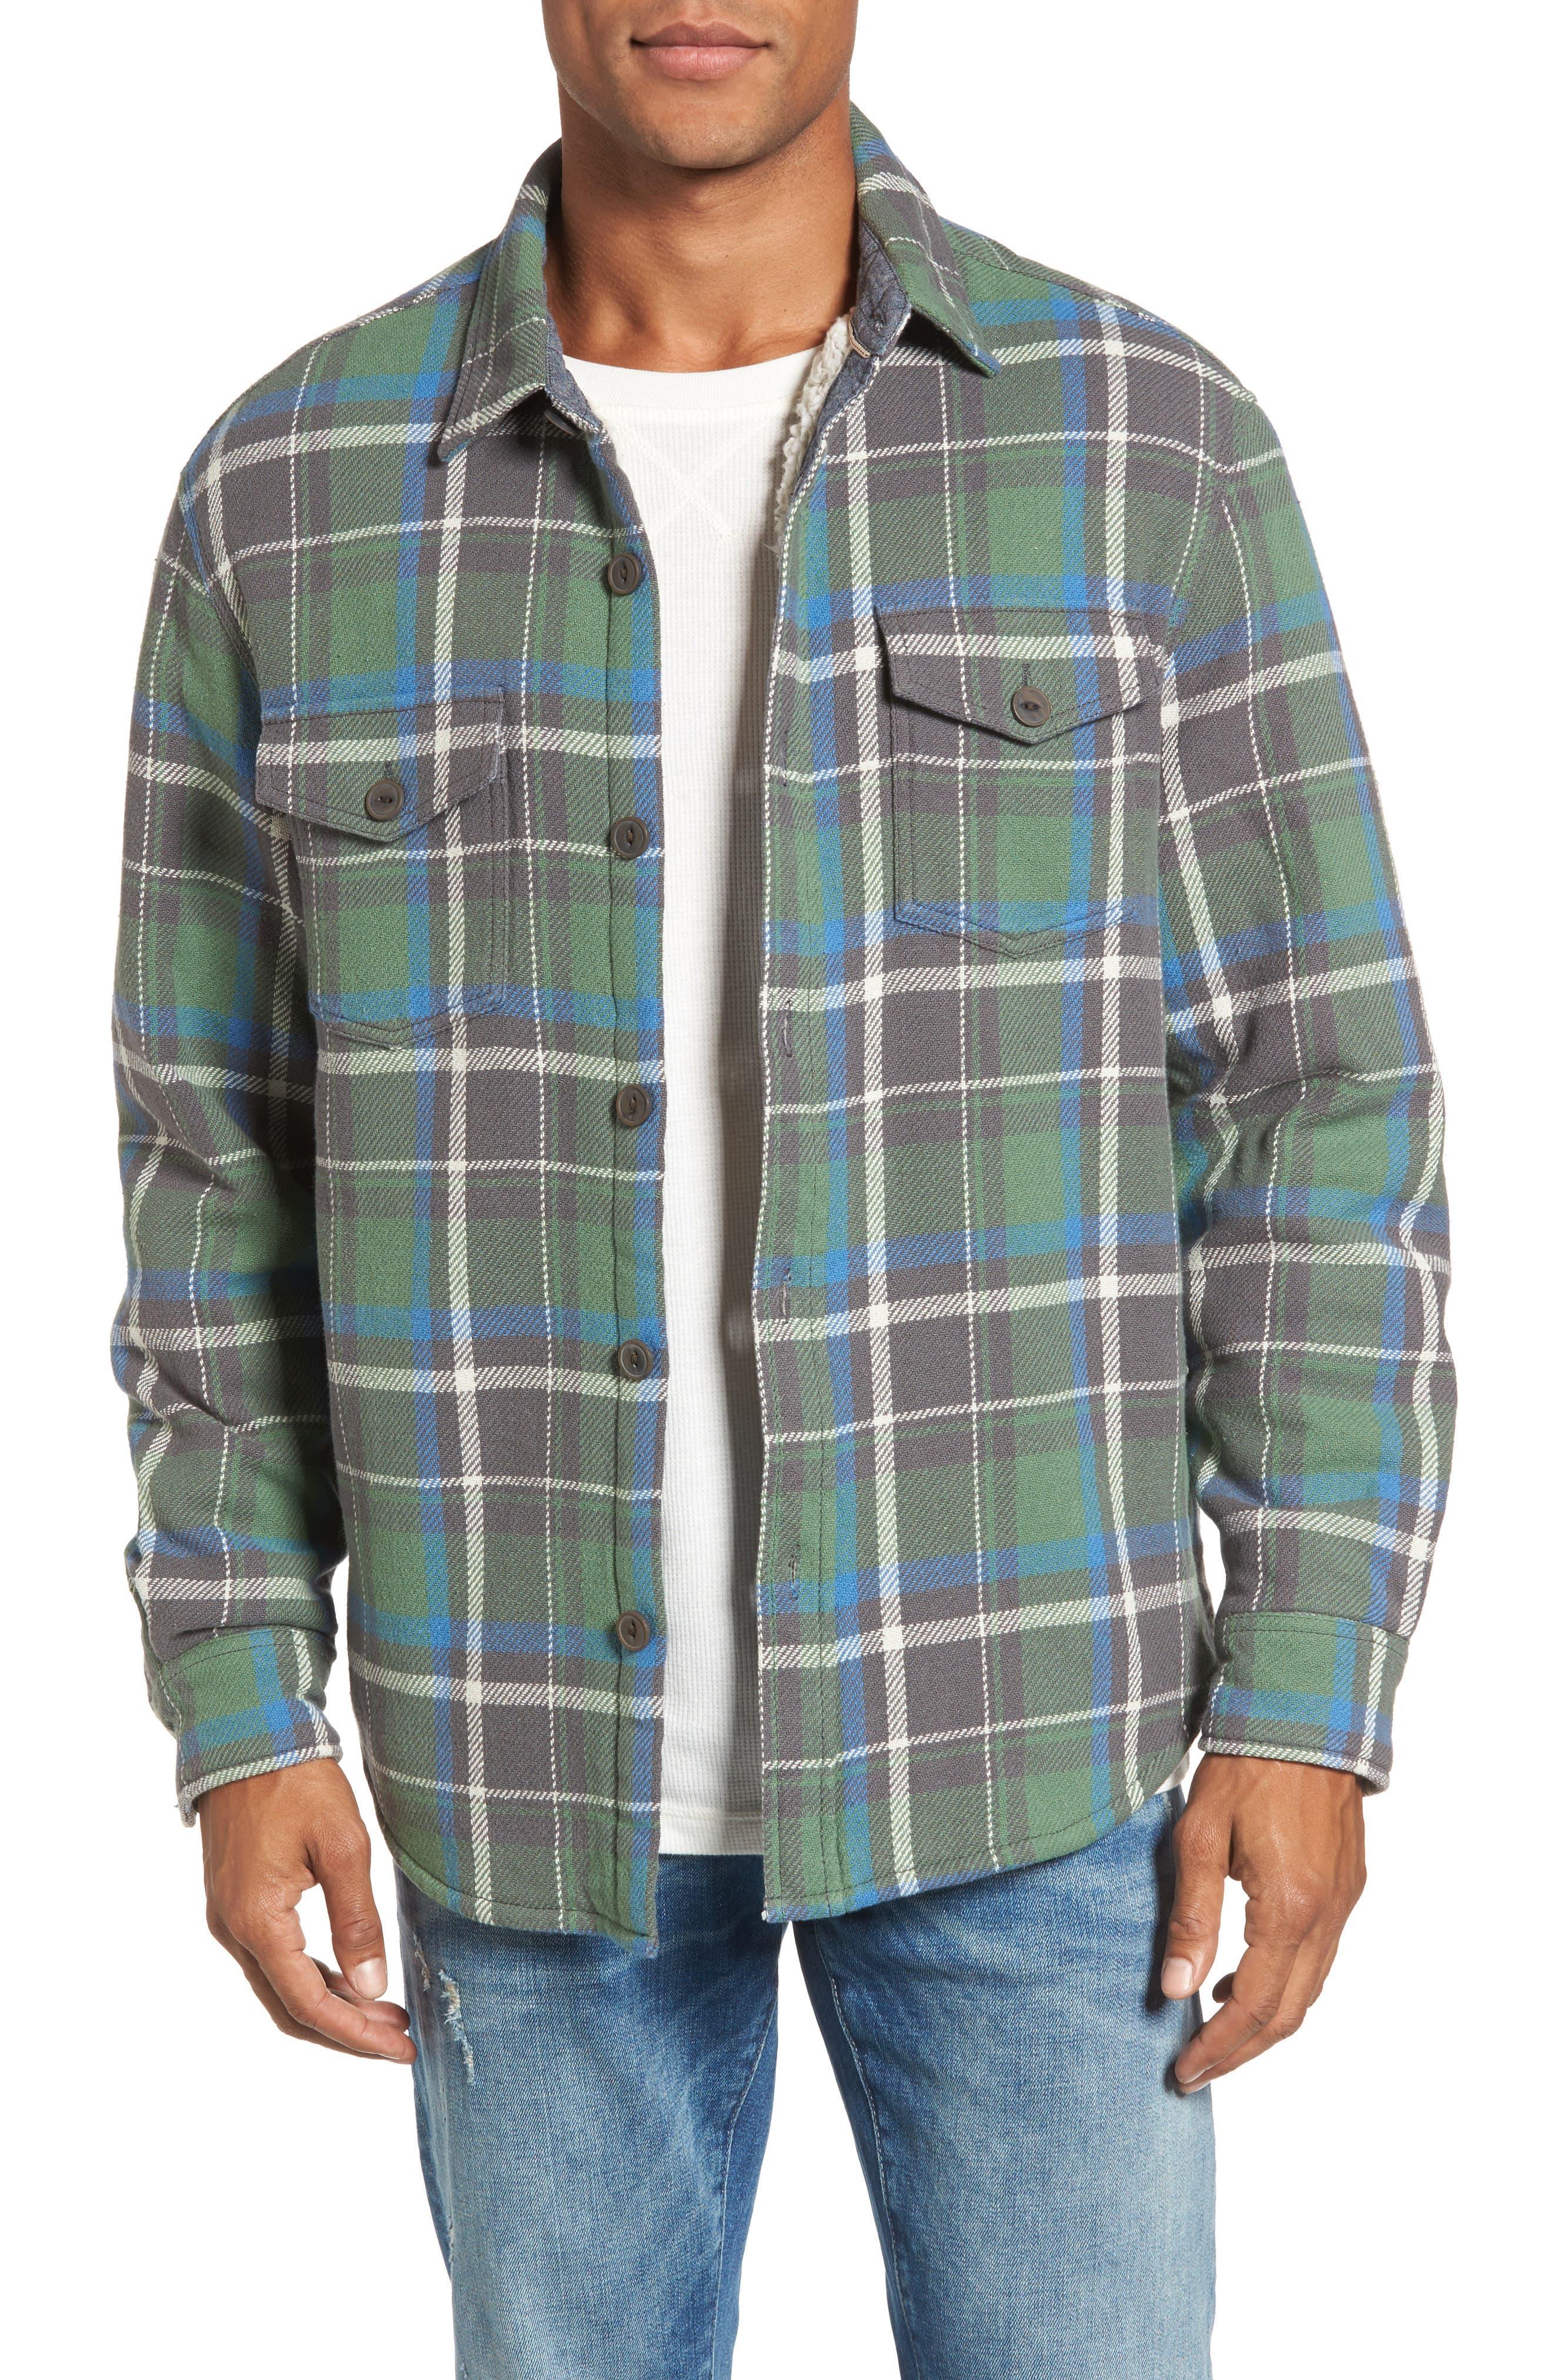 True Grit Summit Hunter Plaid Faux Shearling Lined Shirt Jacket